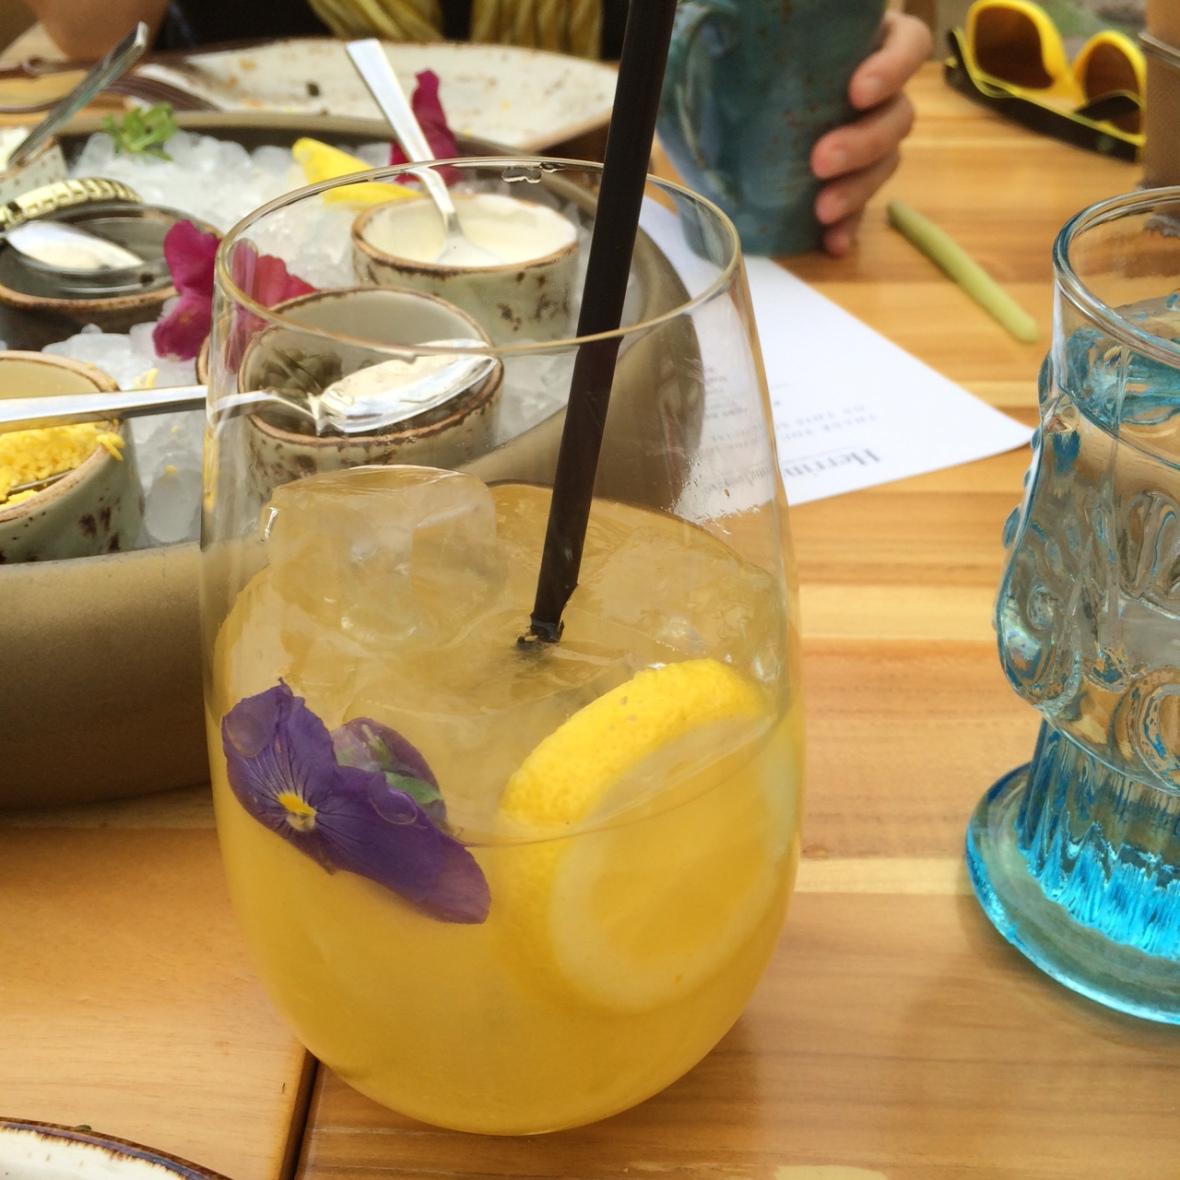 Cocktails and caviar